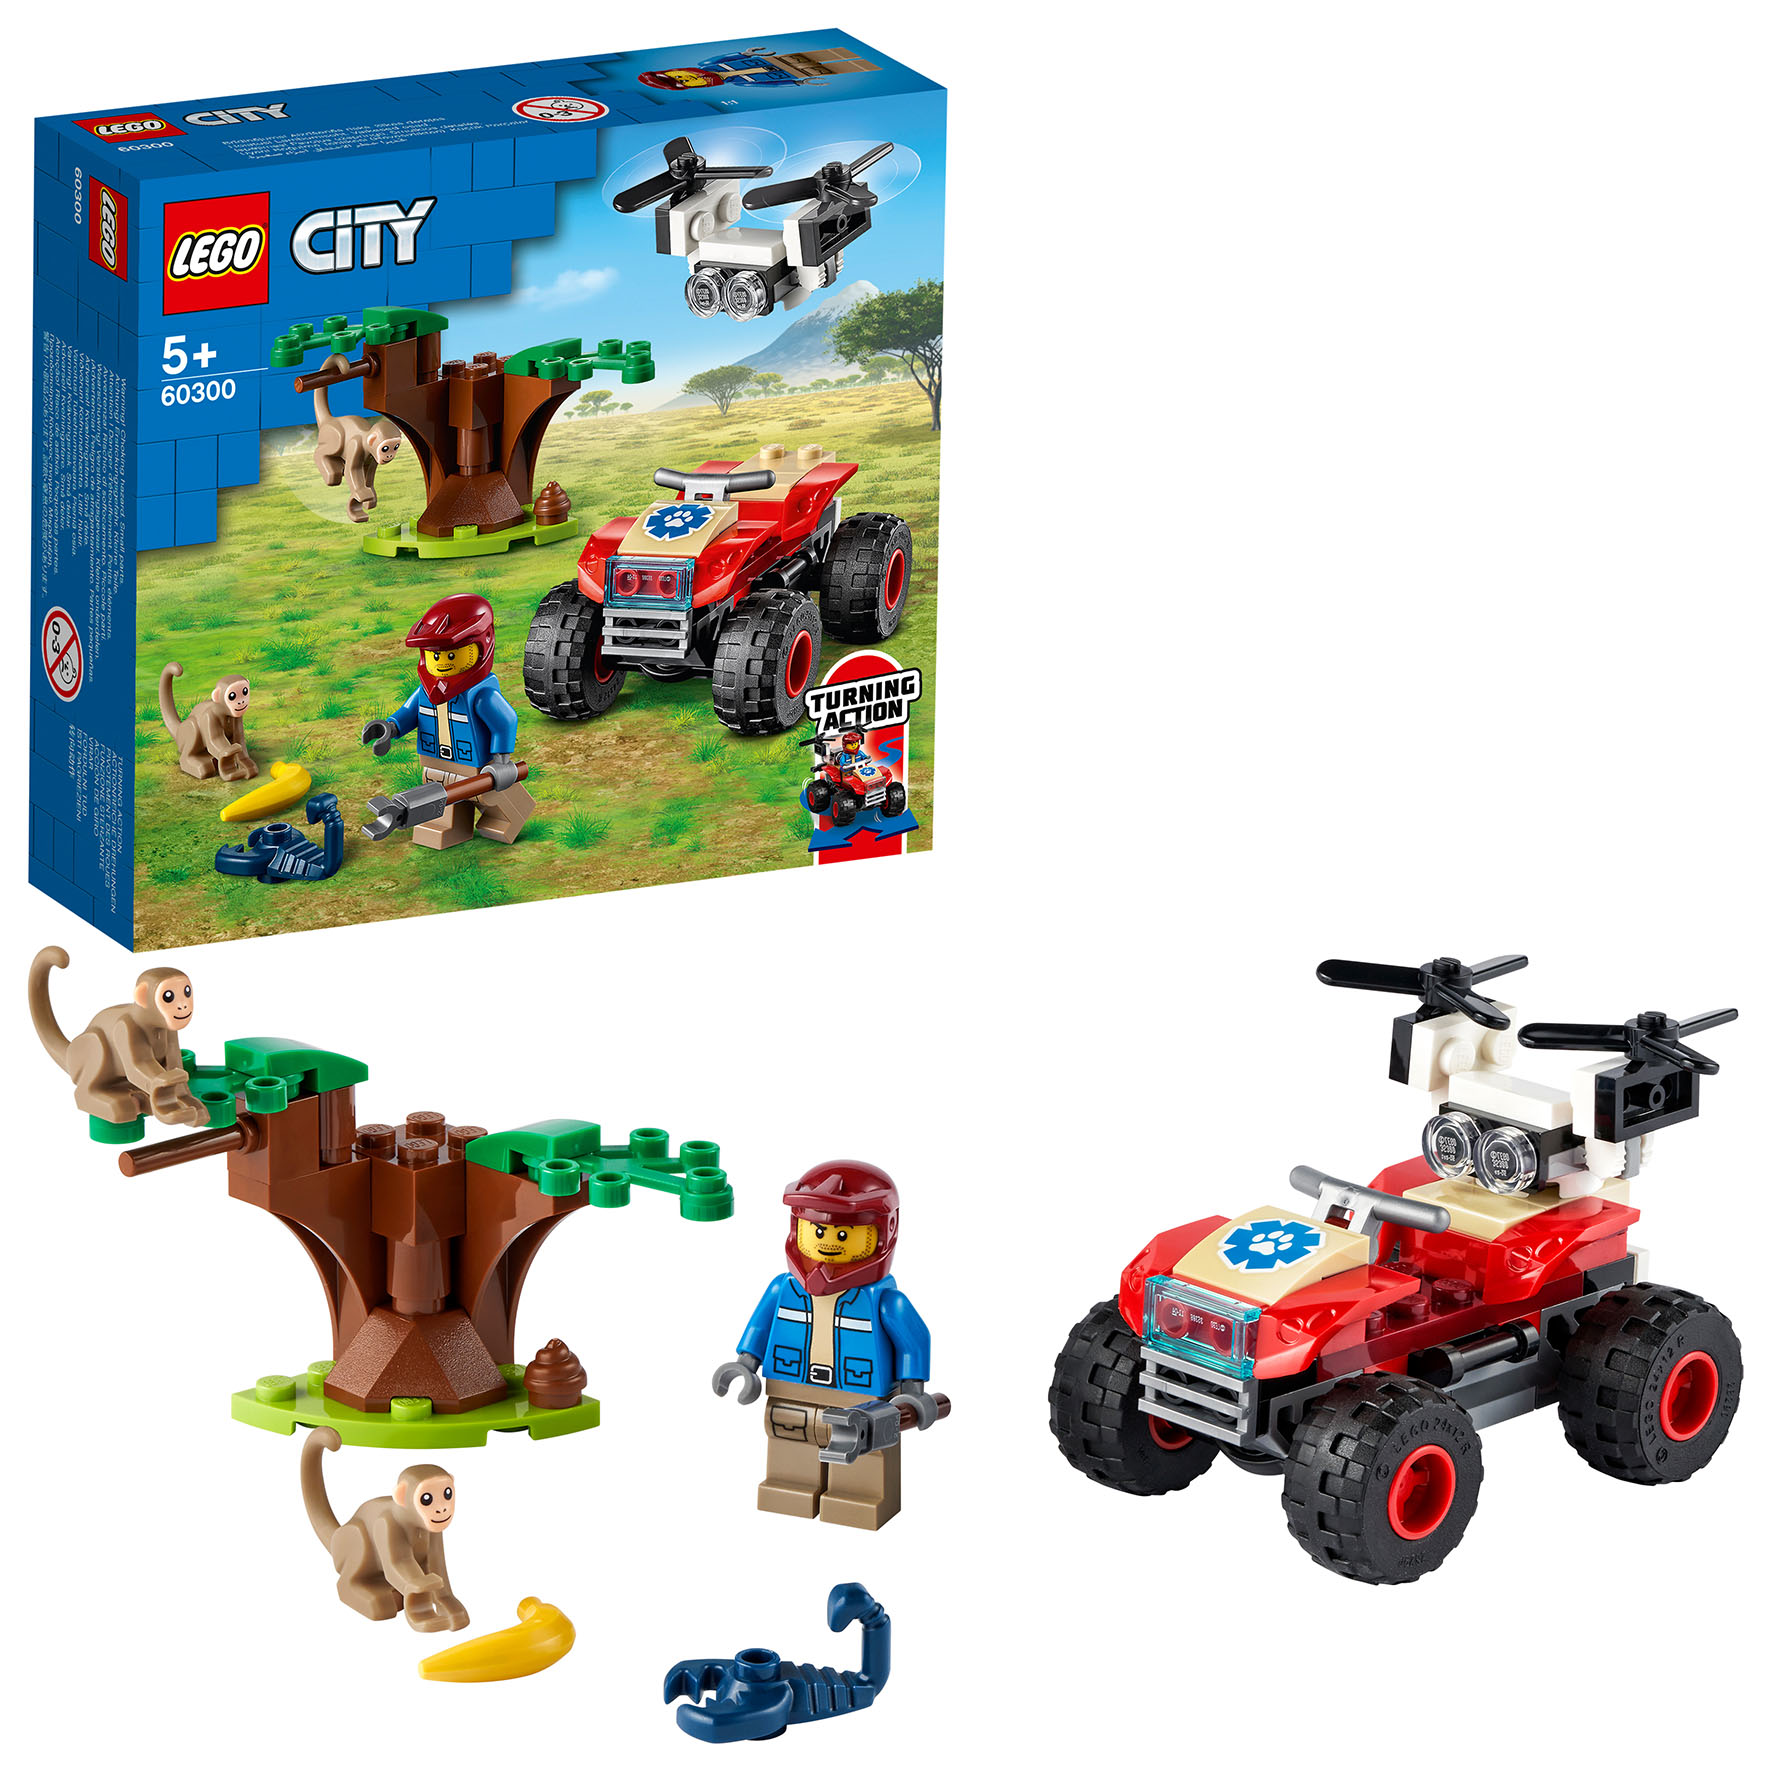 ATV SOCCORSO ANIMALE CITY LEGO